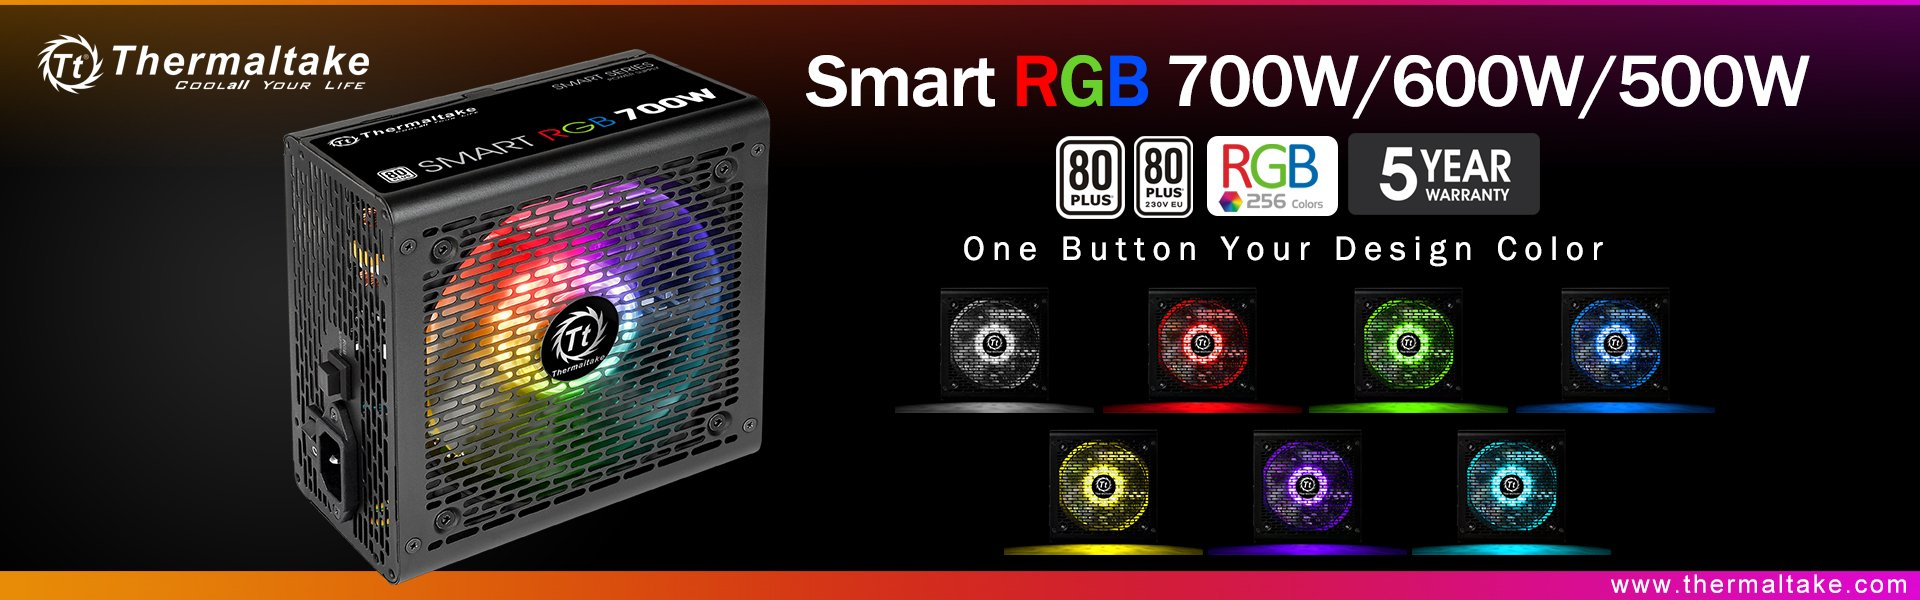 Thermaltake New Smart RGB Power Supply Series 7